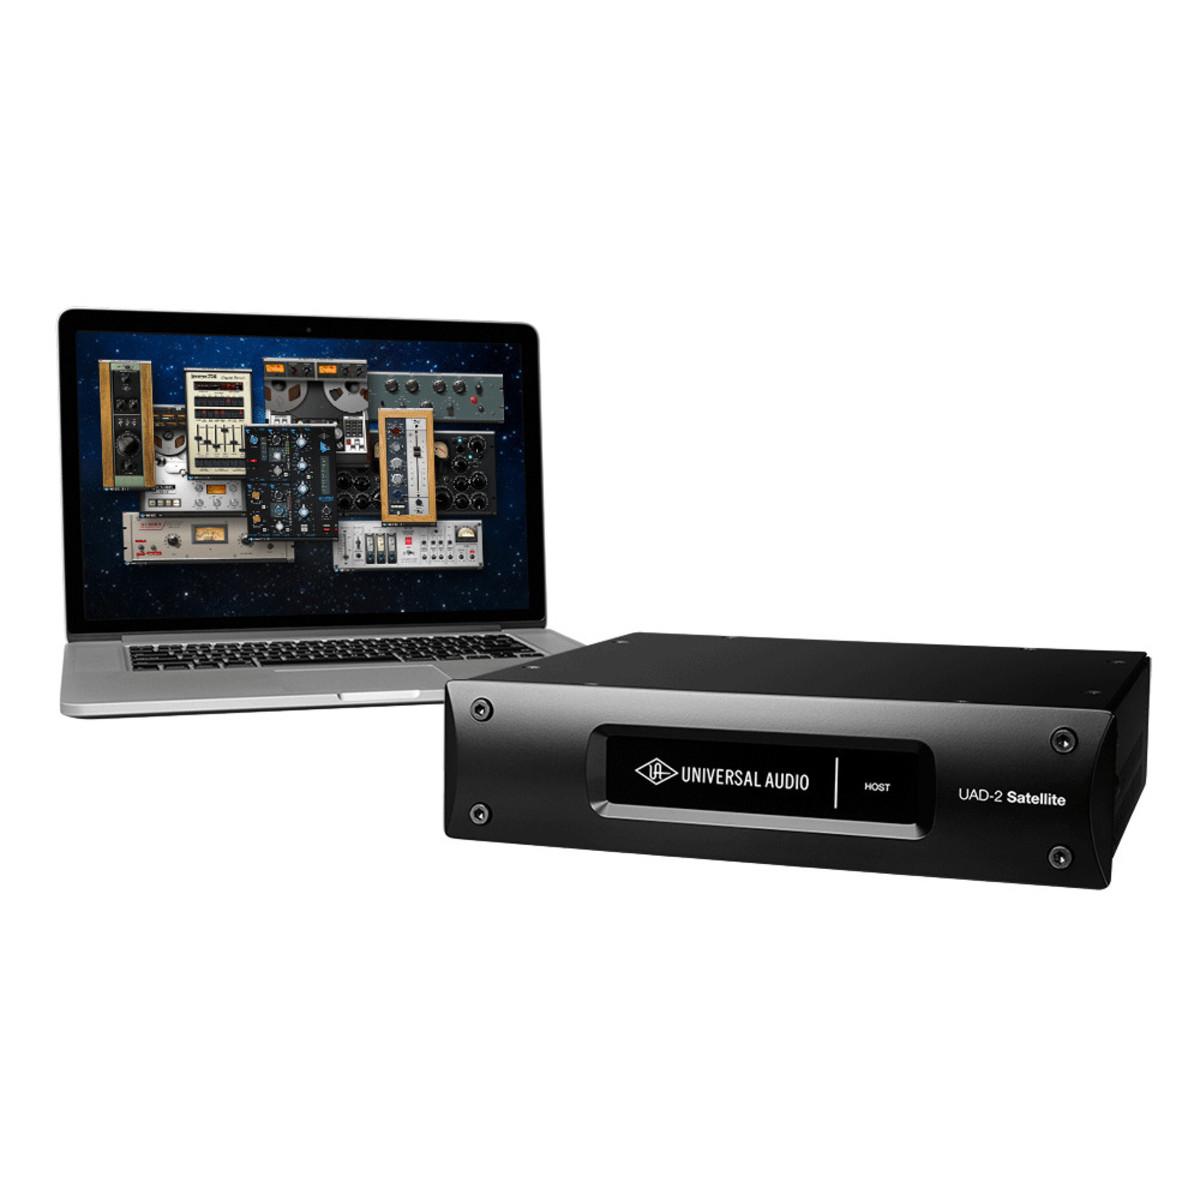 universal audio uad 2 satellite thunderbolt quad core at gear4music. Black Bedroom Furniture Sets. Home Design Ideas